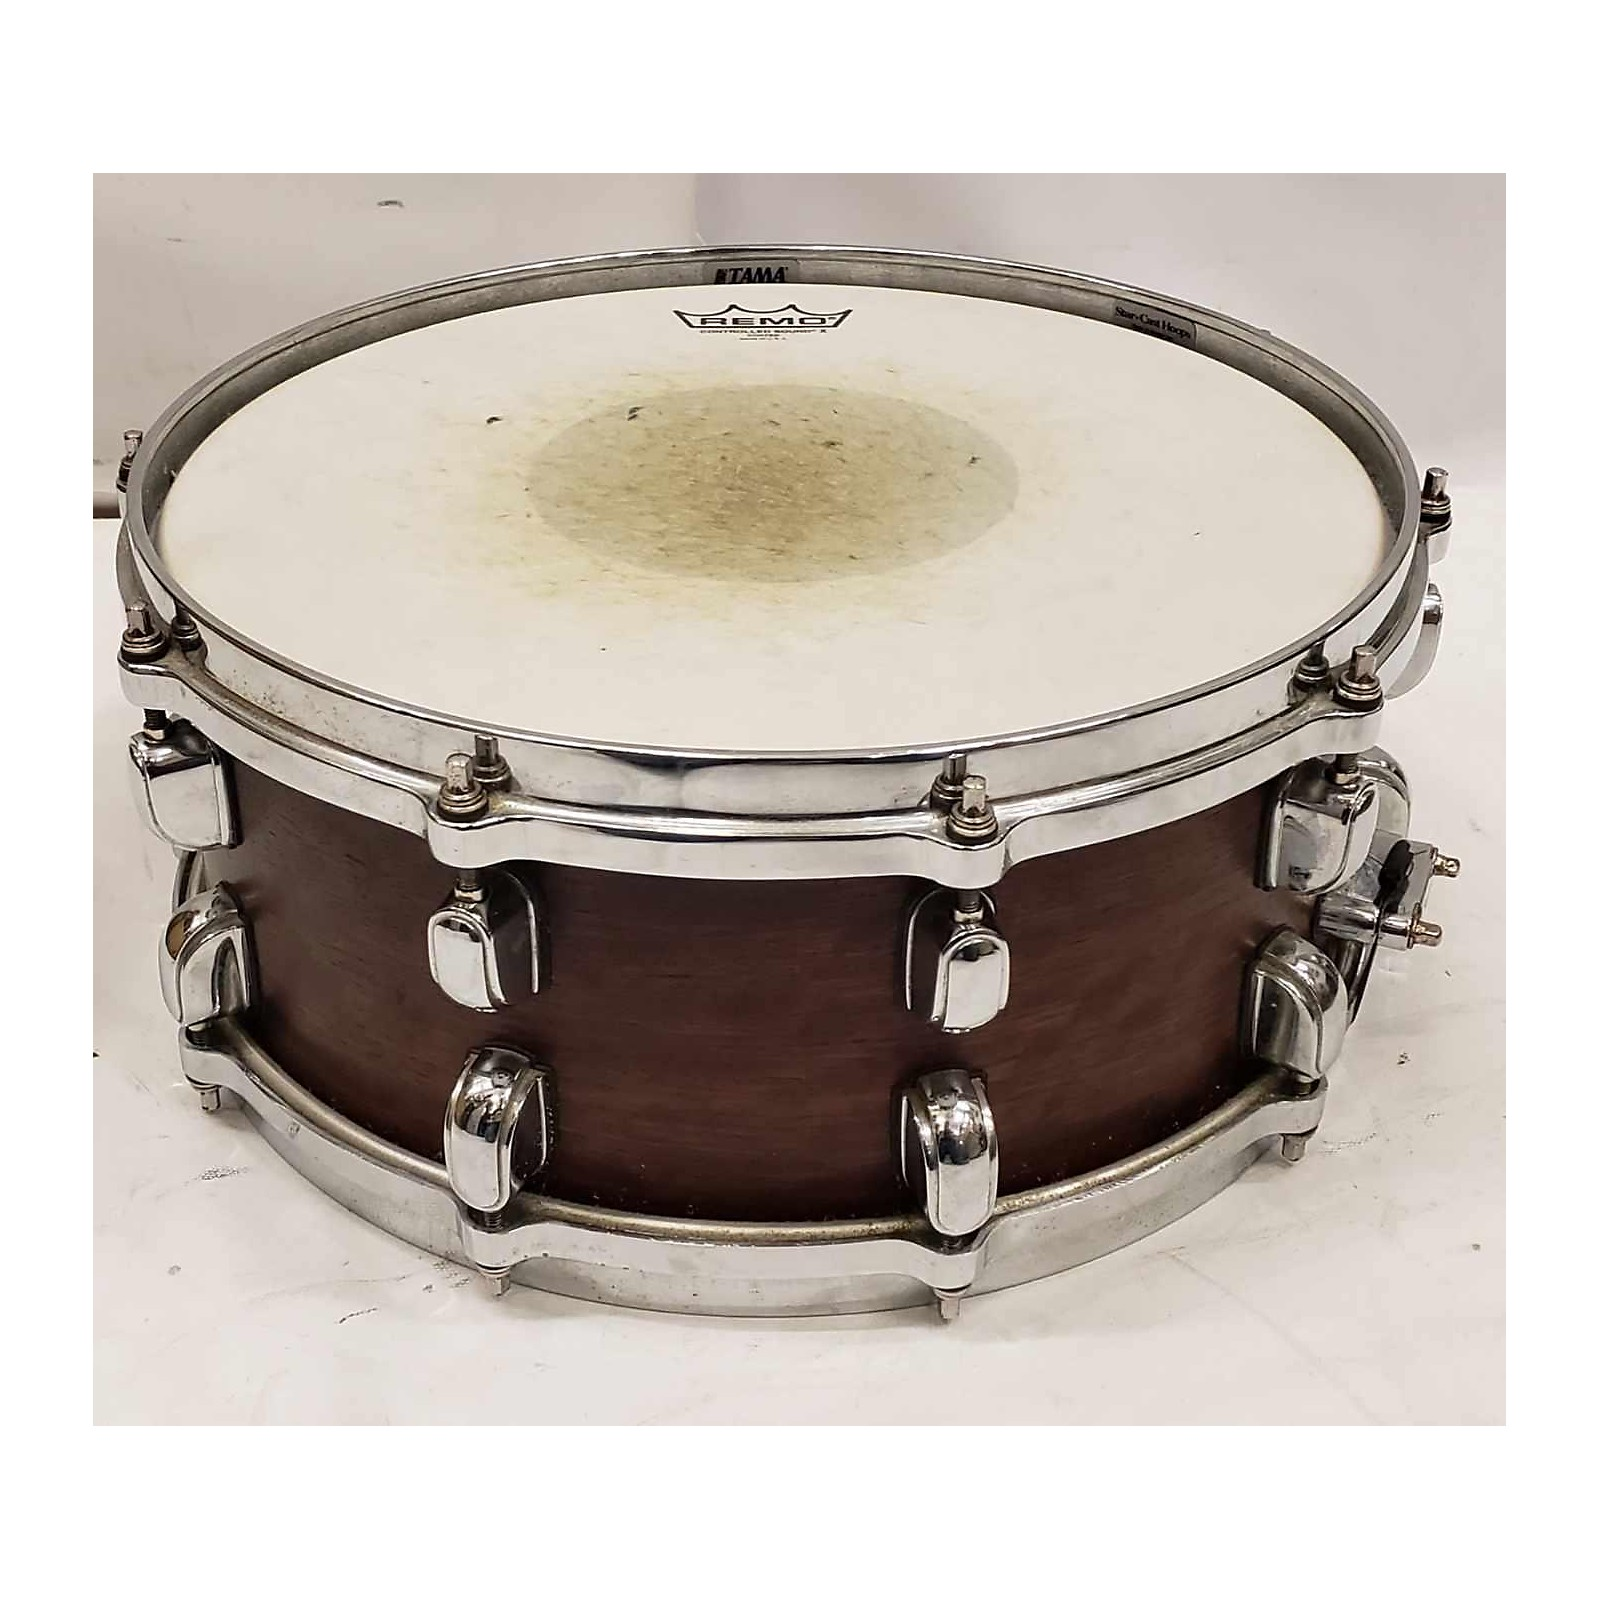 TAMA 14X6.5 Starclassic Snare Walnut/Birch Drum